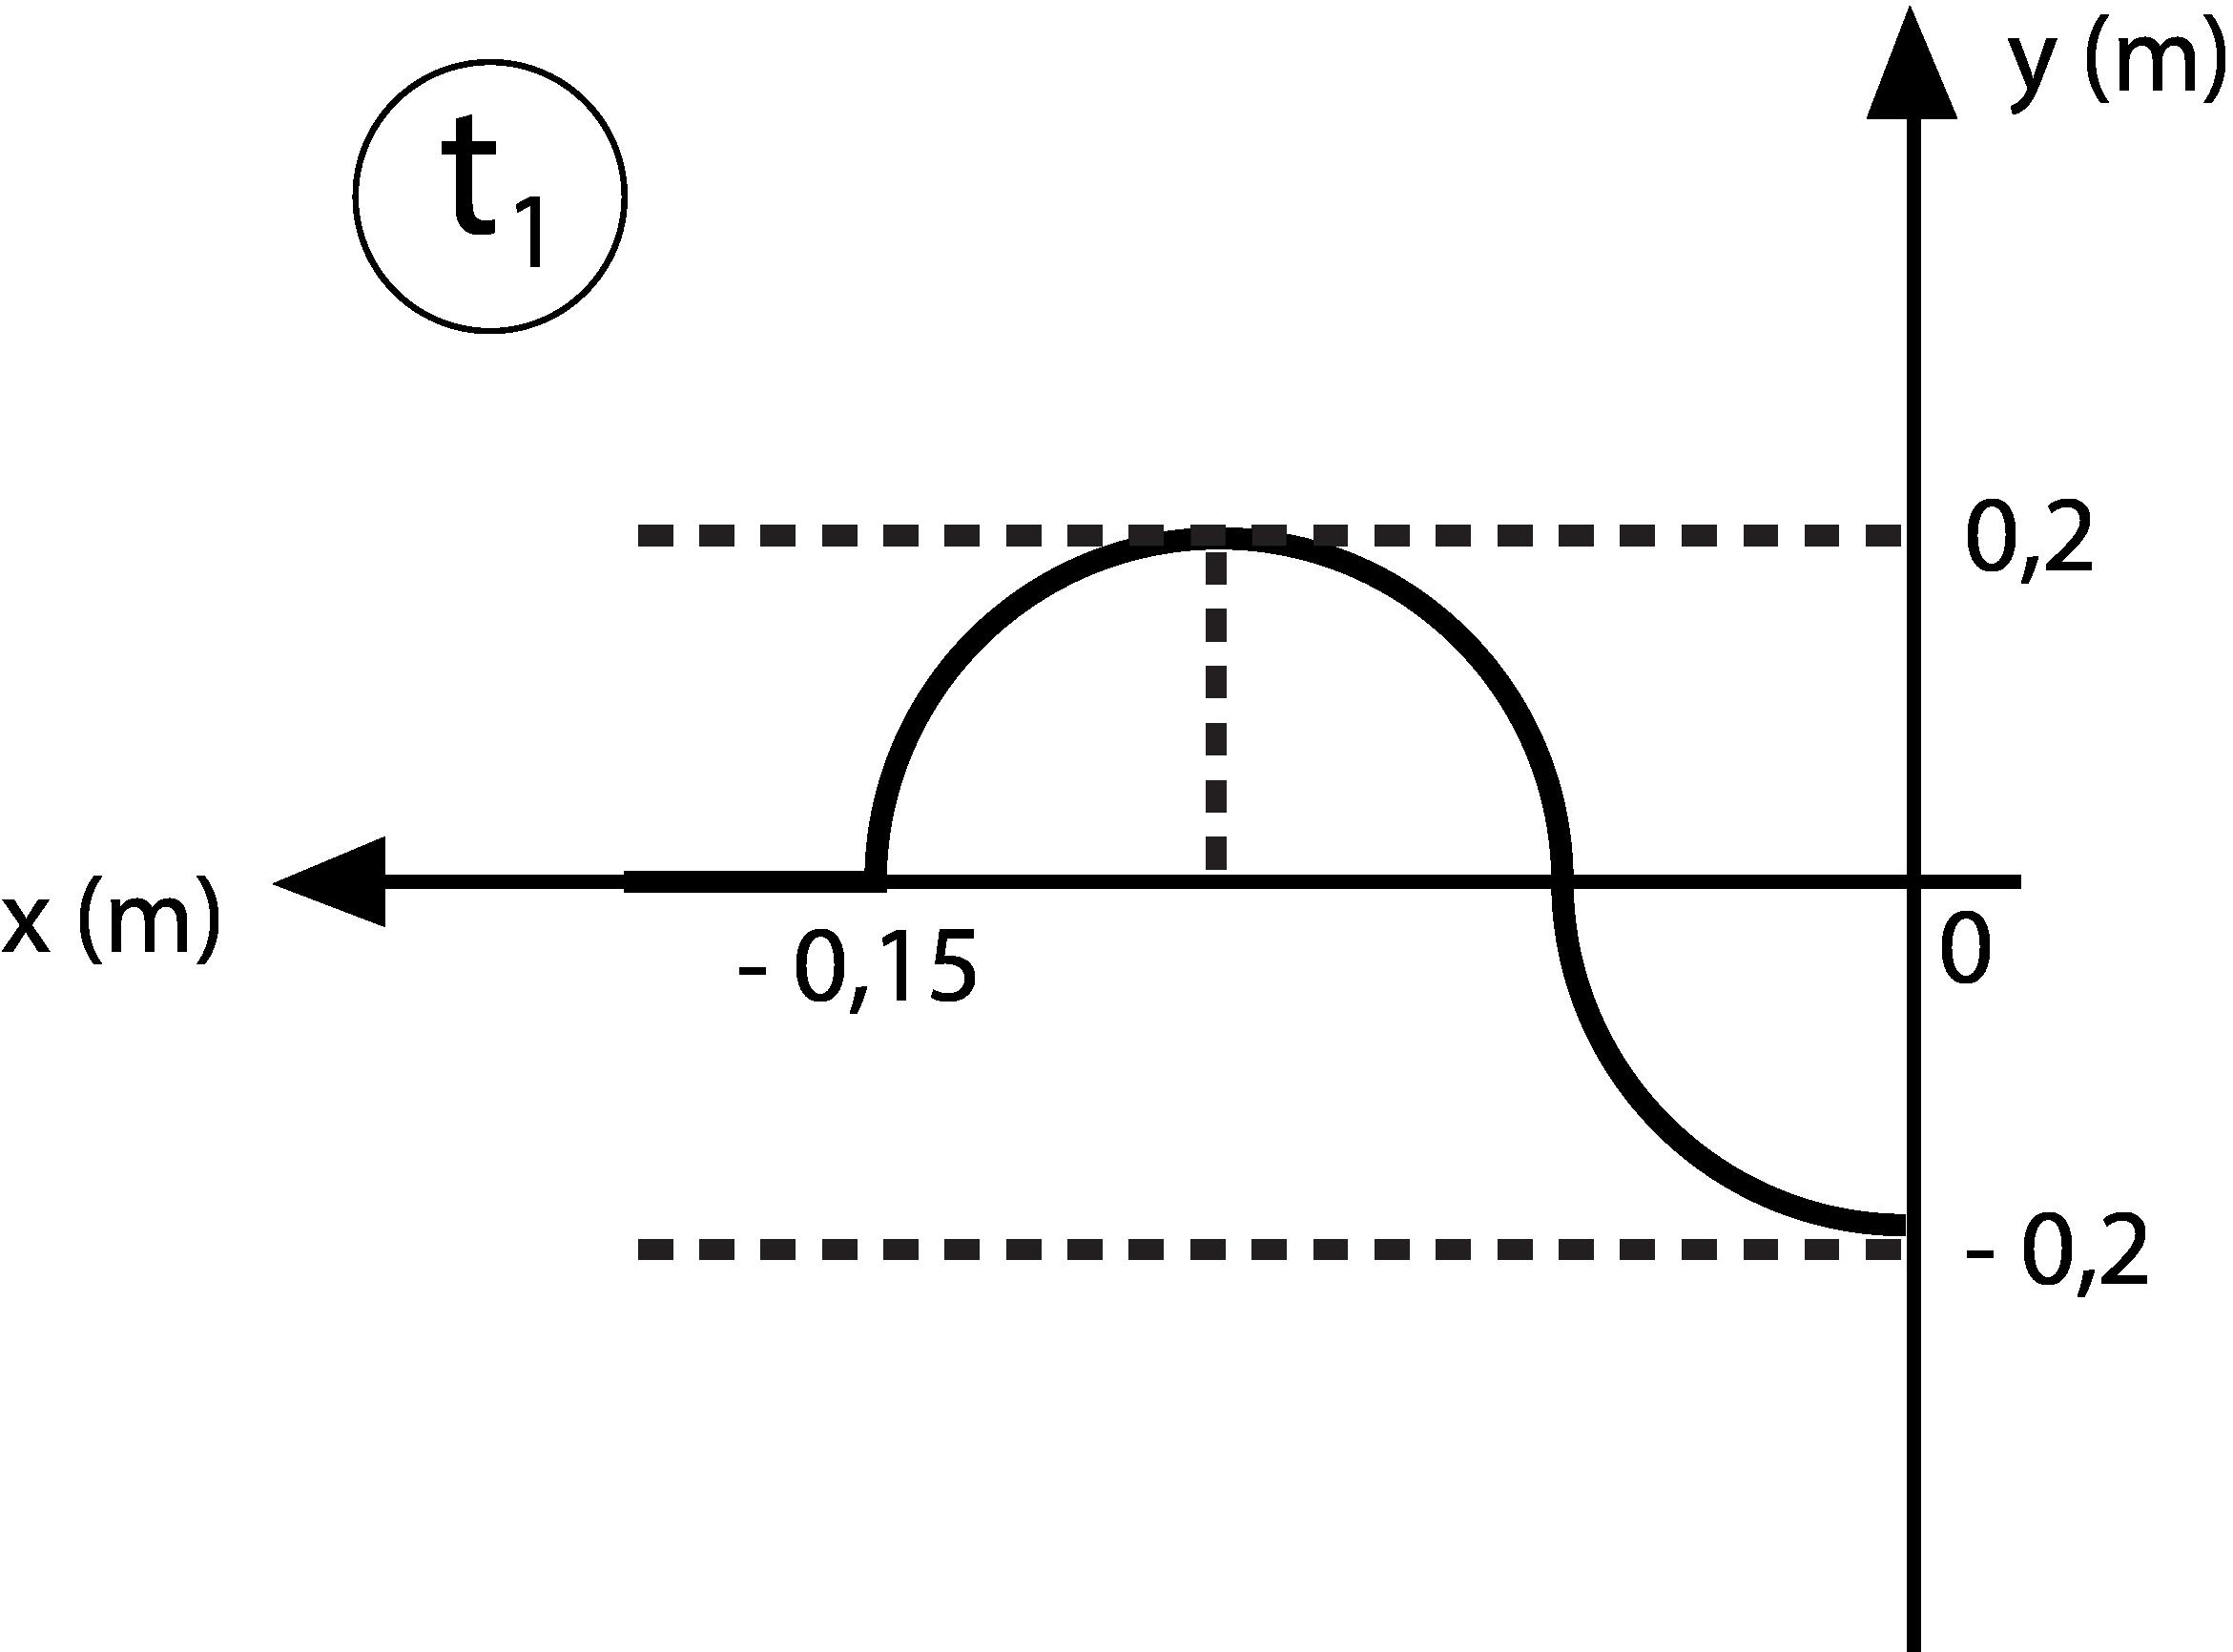 Lab4U — Εύρεση Εξίσωσης Επιτάχυνσης από Στιγμιότυπο Εγκάρσιου Αρμονικού  Κύματος b1c50b96d70